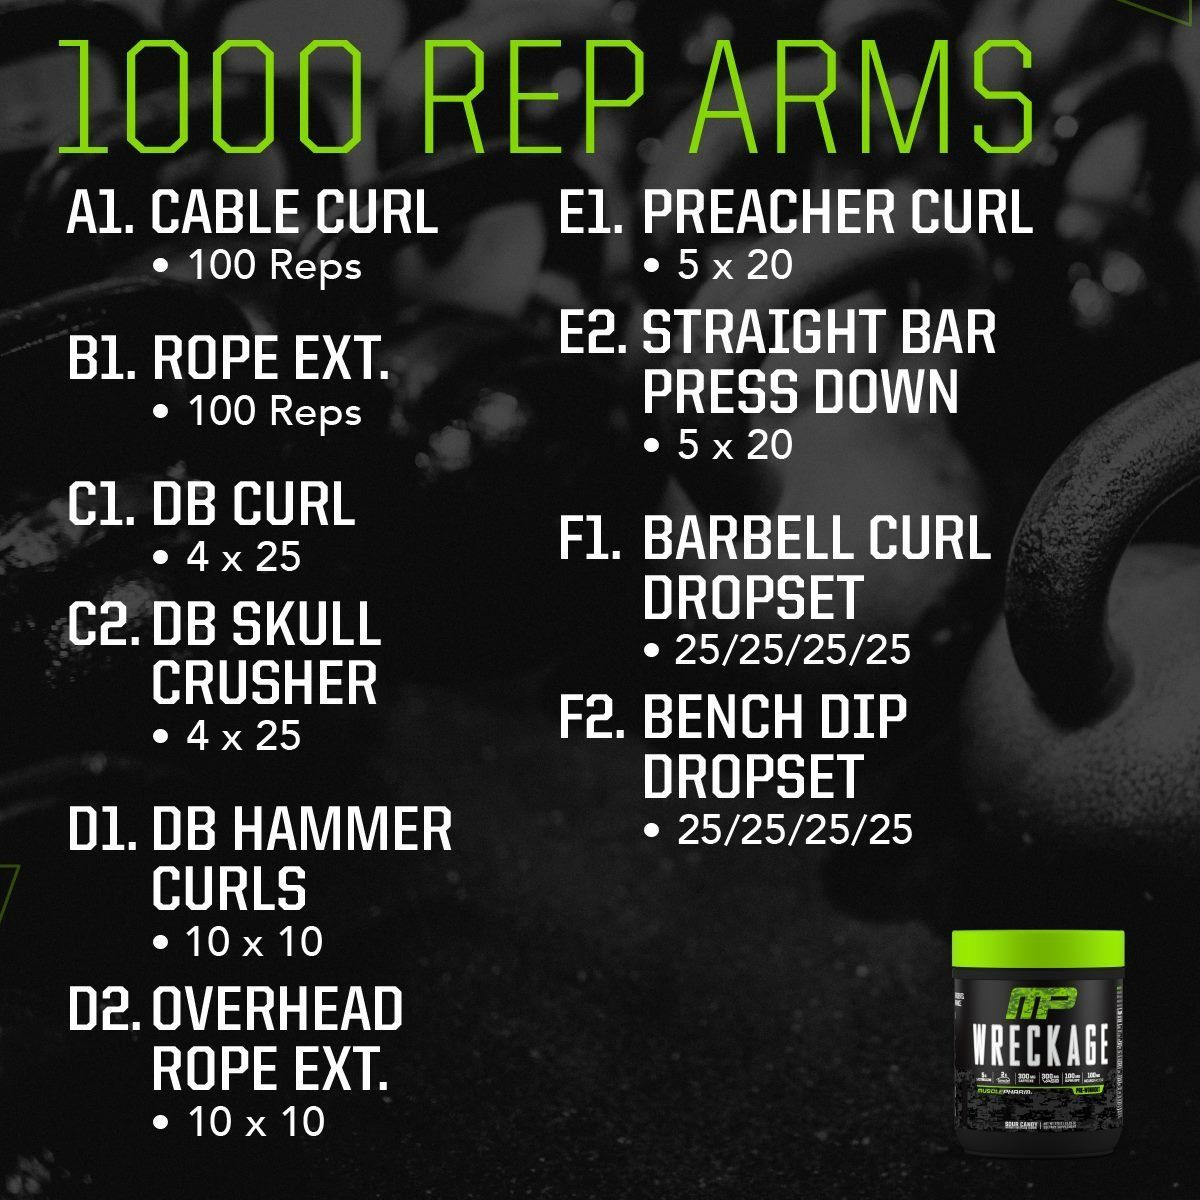 Completegymworkoutplan Ectomorph Workout Musclepharm Workouts Arm Workout